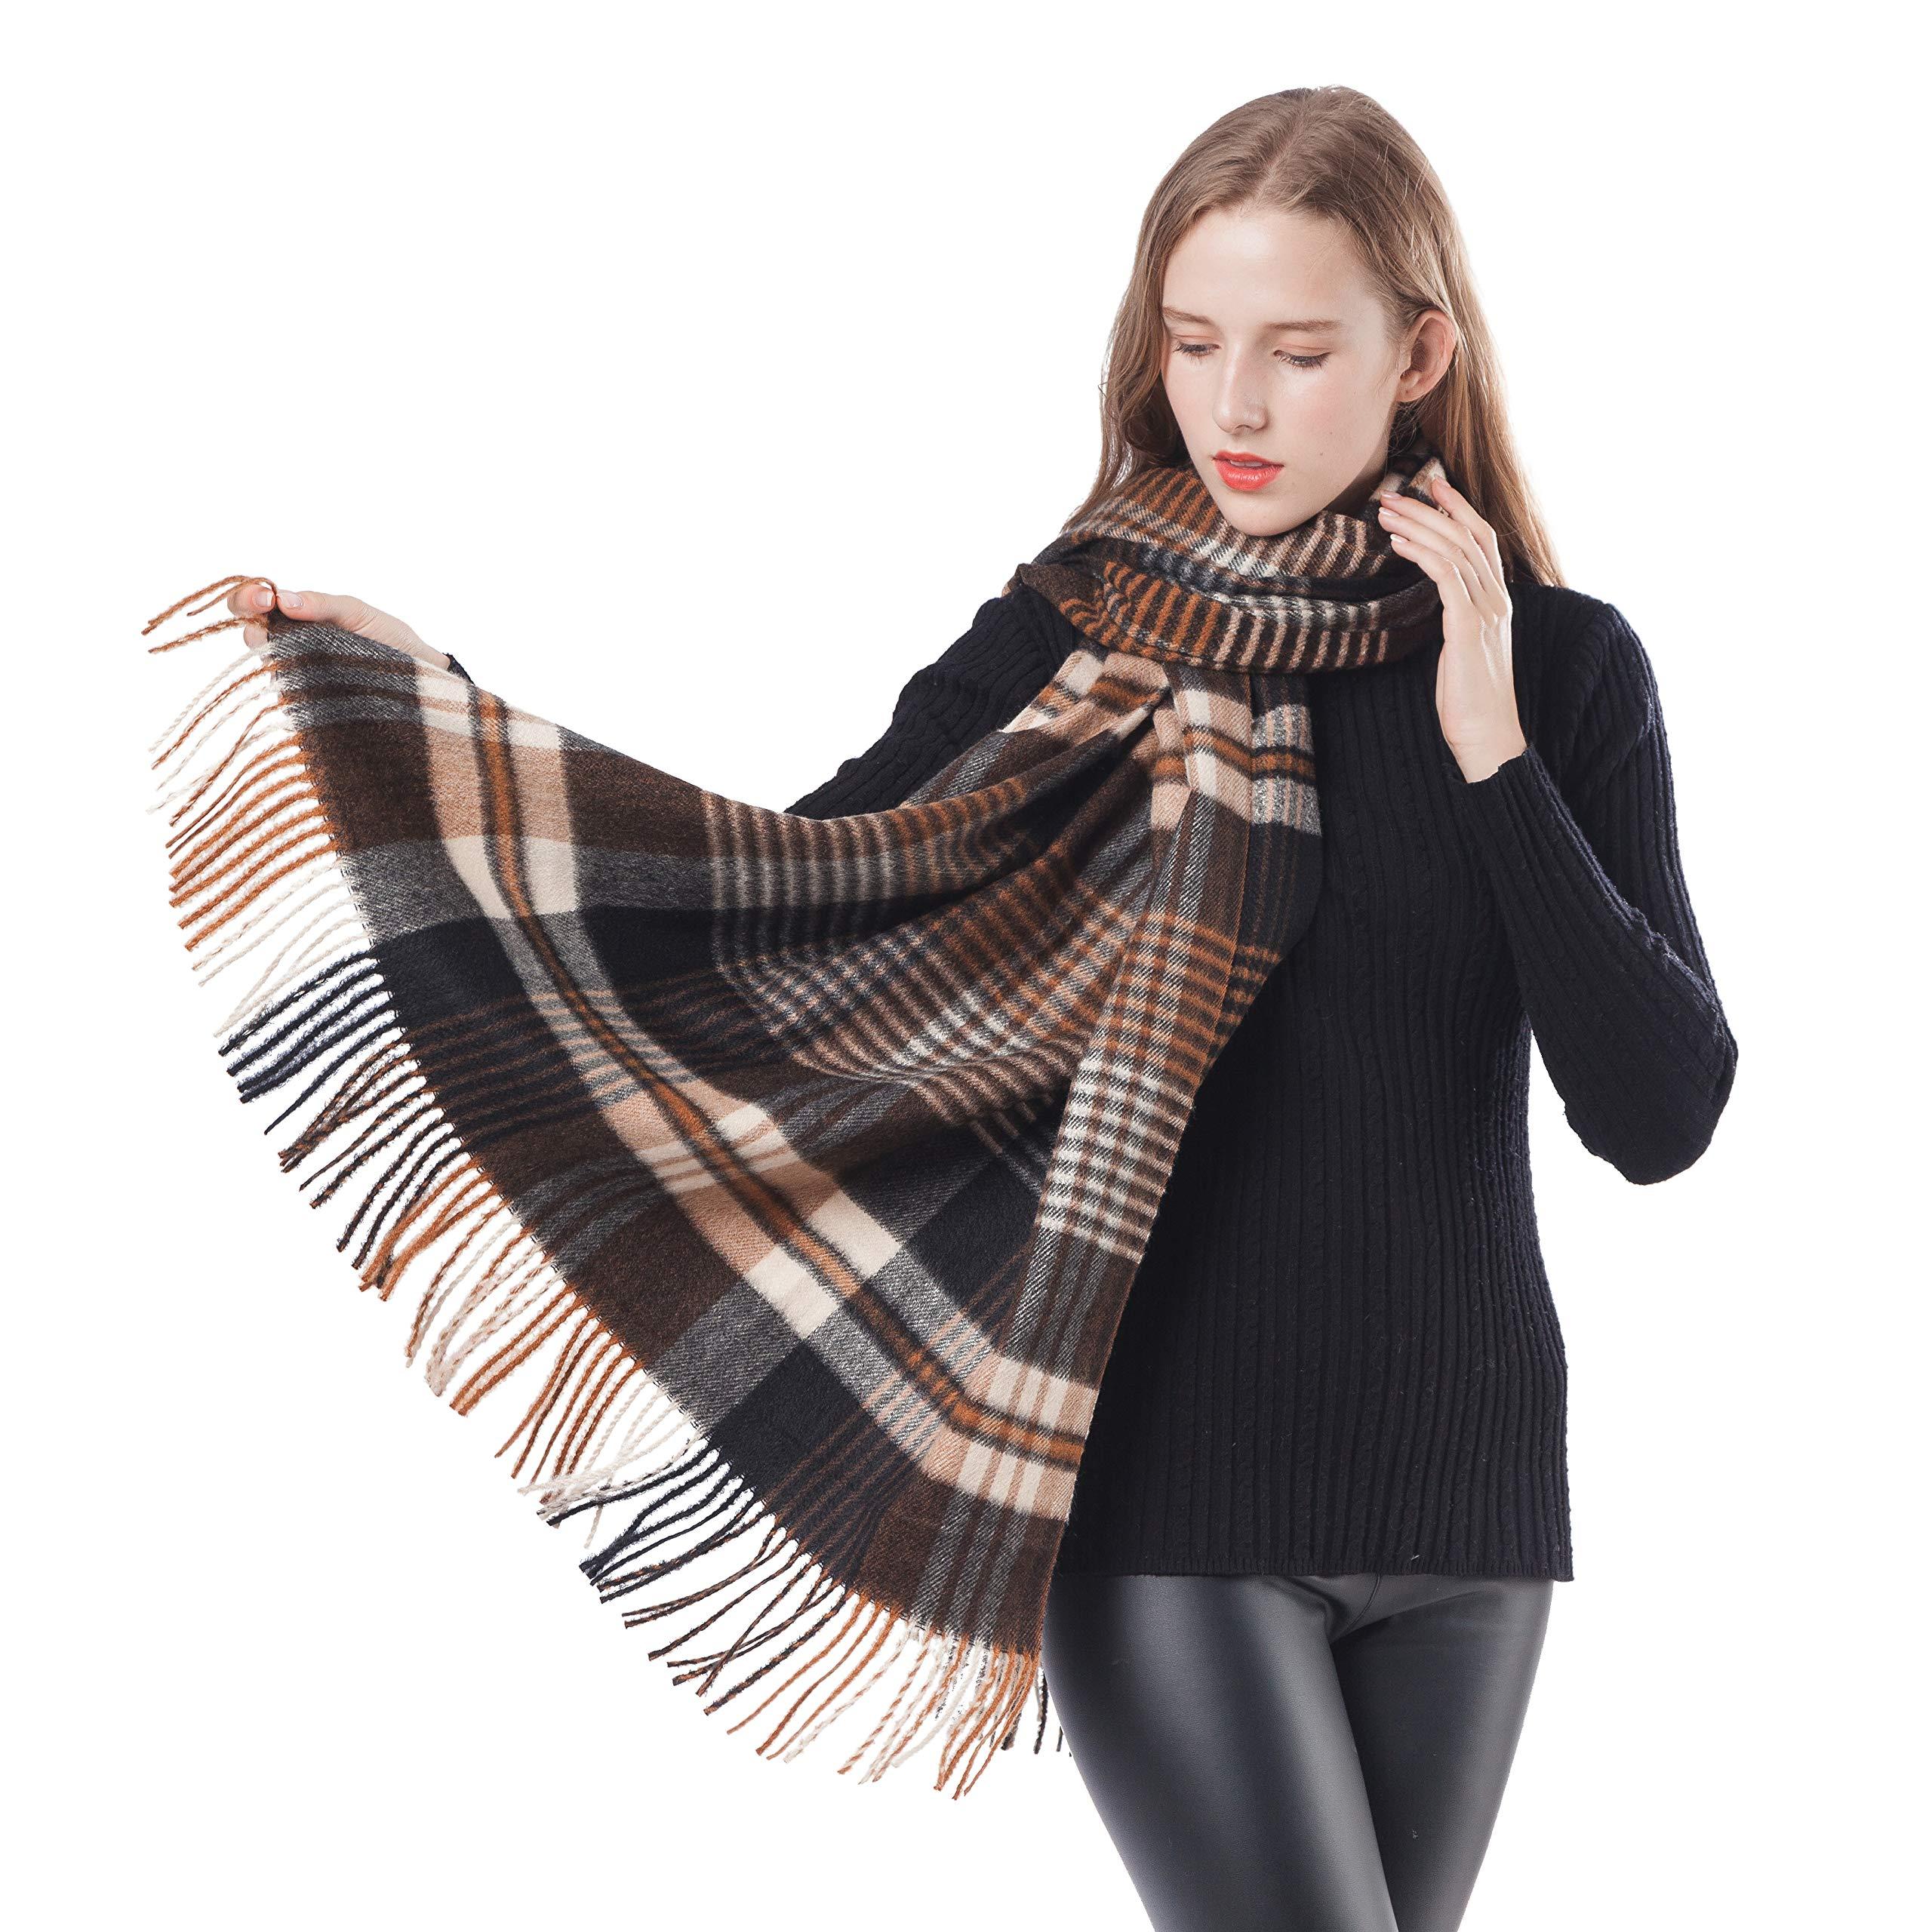 Women Large Pashminas Shawl Wraps Soft Cashmere Wool Plaid Scarf for Men Winter Warm Cape (Coffee+Black Plaid)